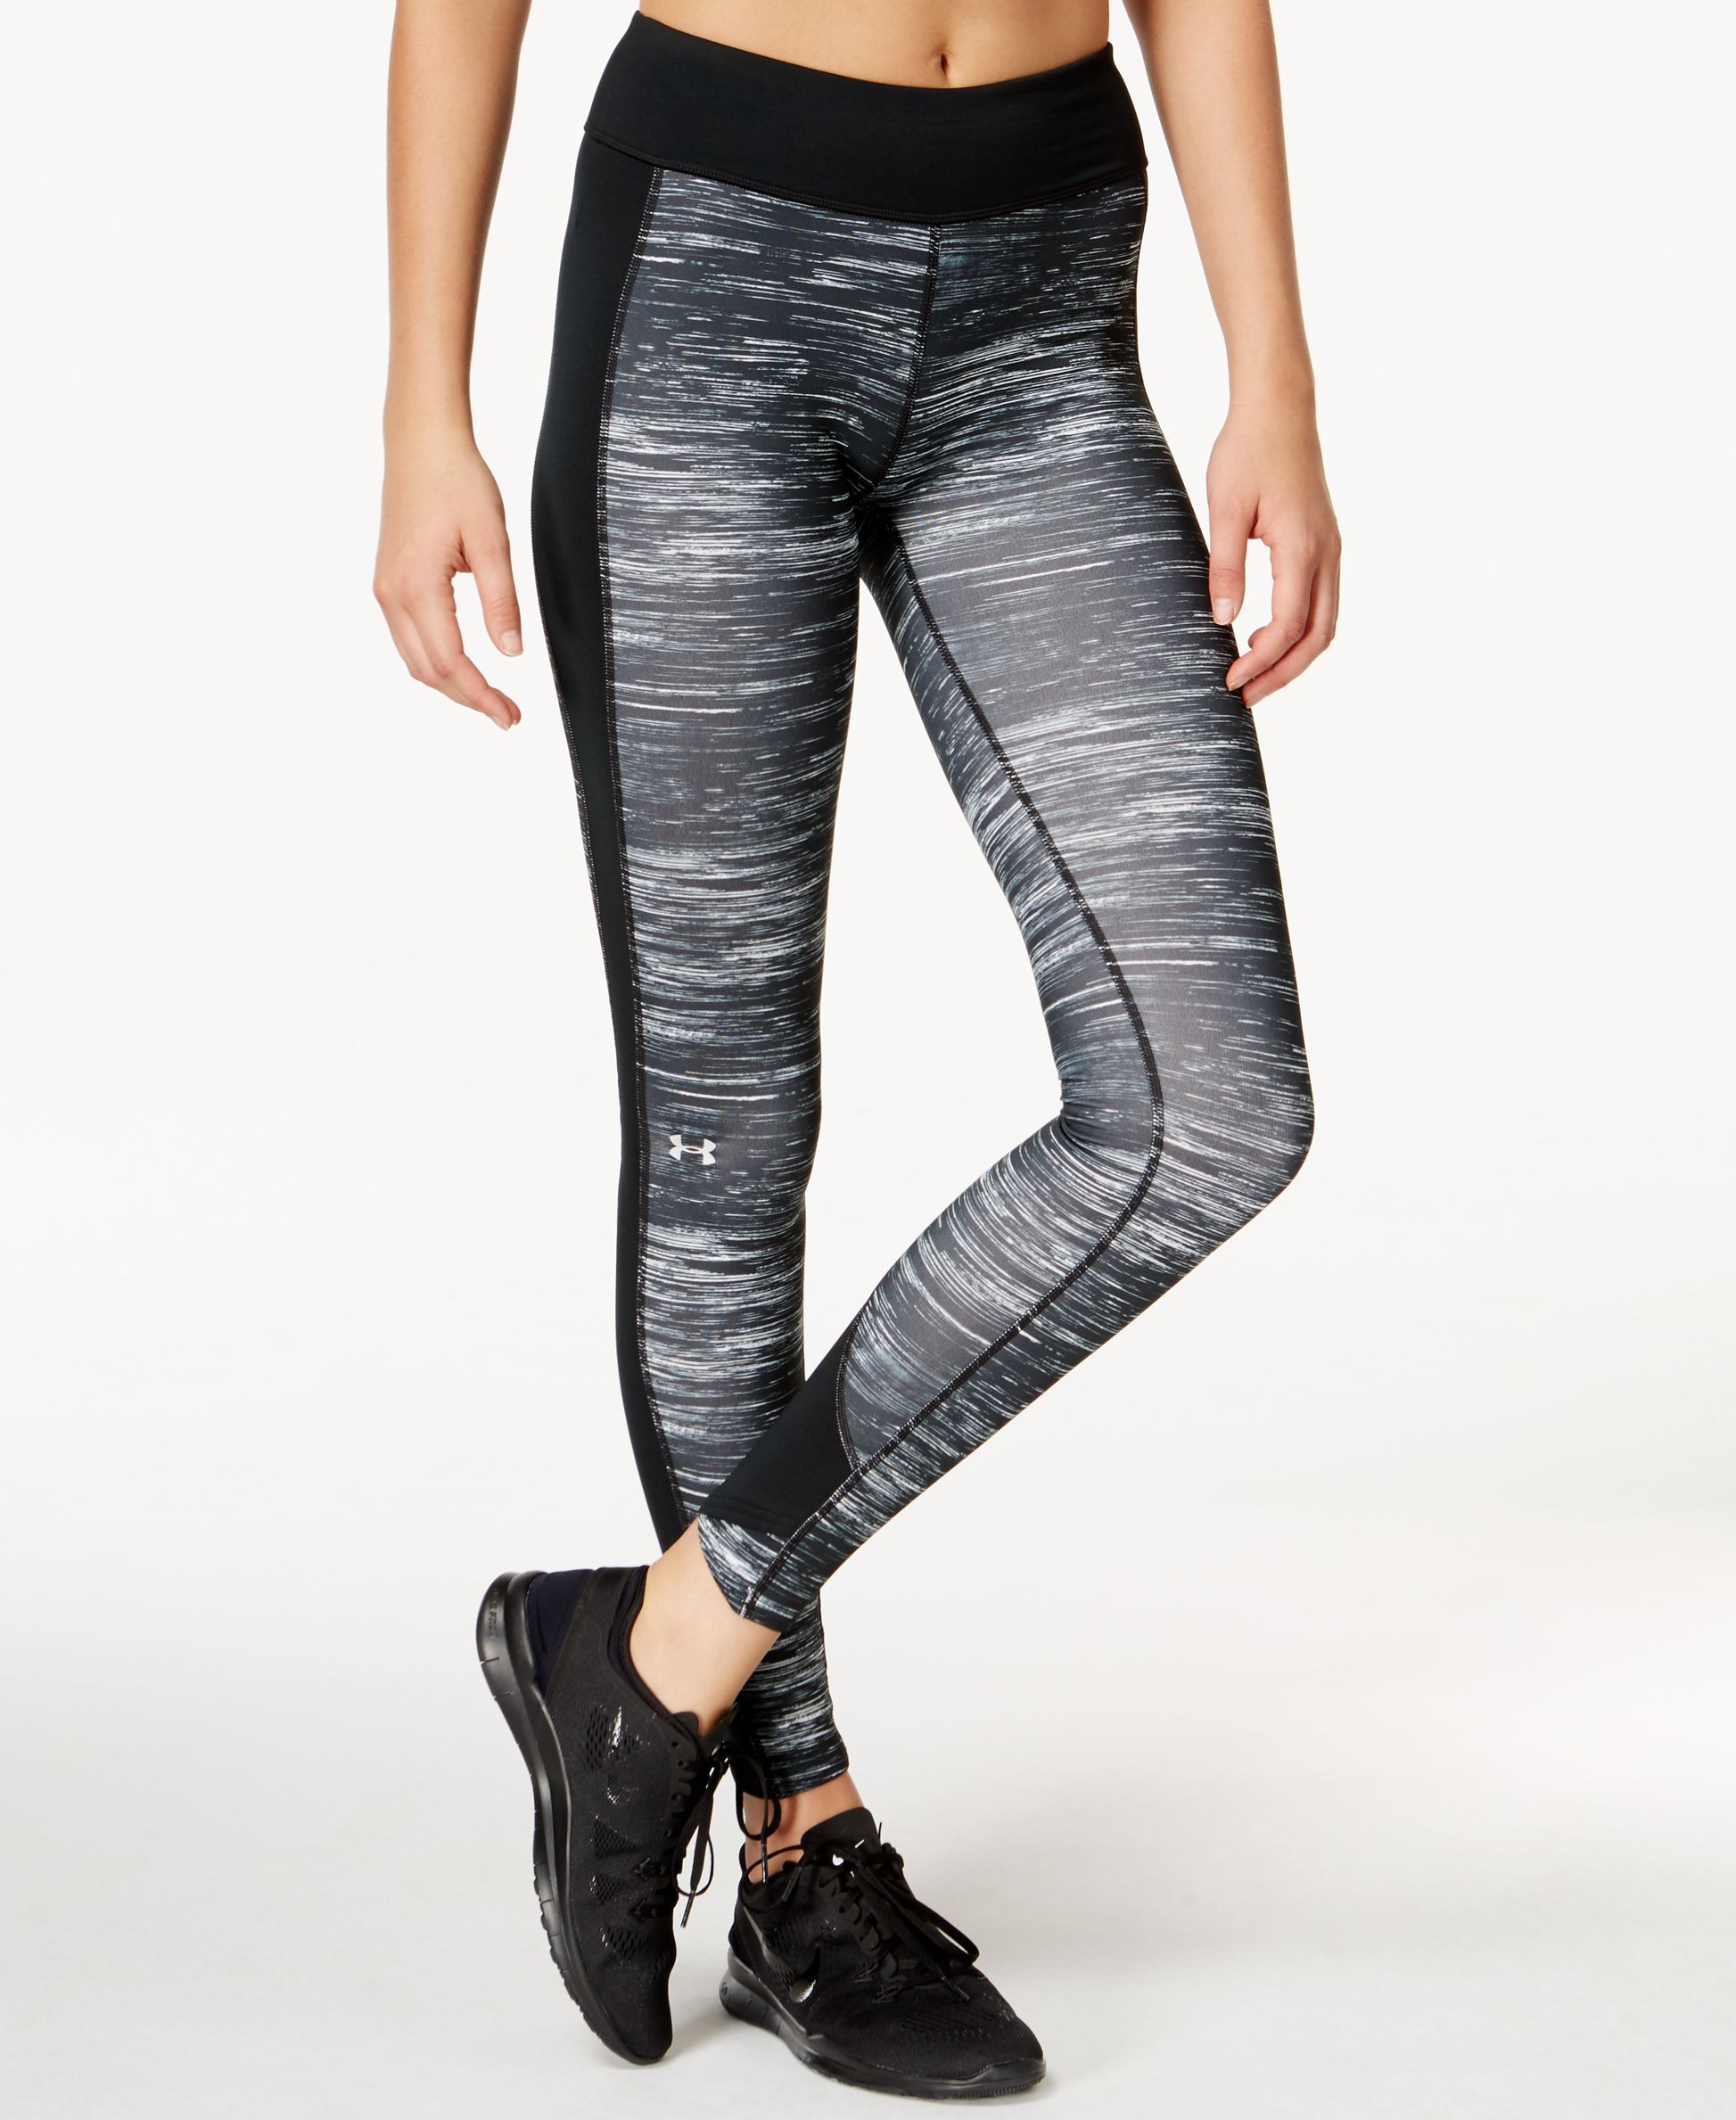 23f90fa276b9a Under Armour ColdGear Print Leggings   Products   Printed leggings ...